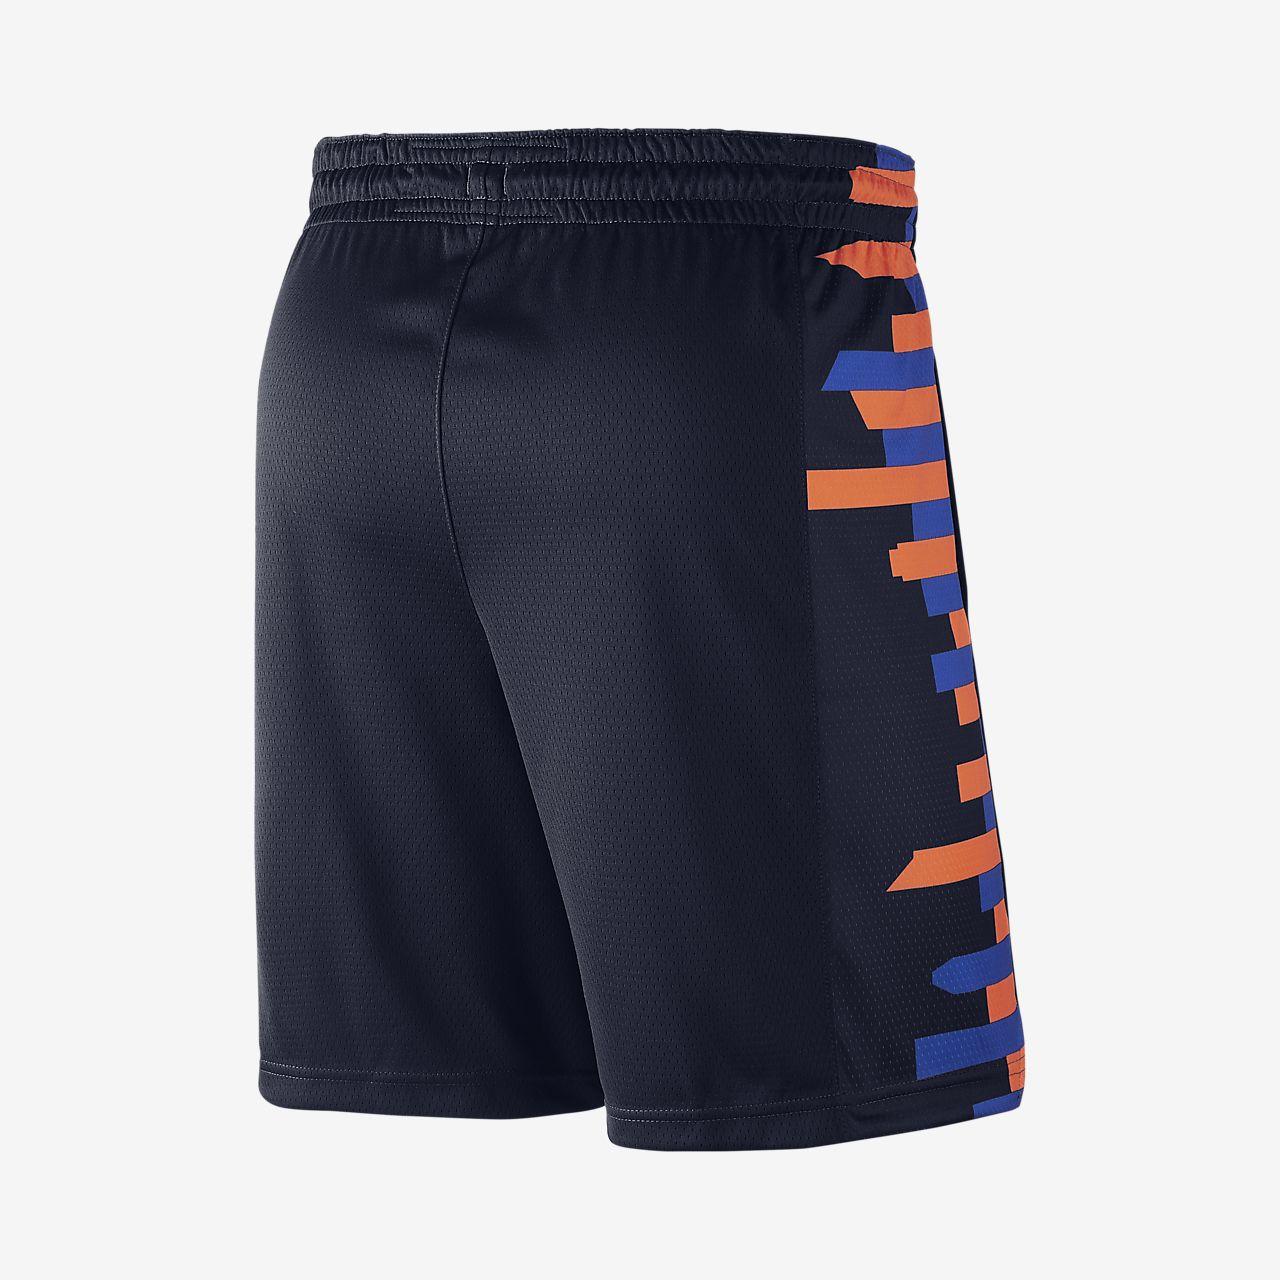 new products 53370 2a6cc ... New York Knicks City Edition Swingman Men s Nike NBA Shorts